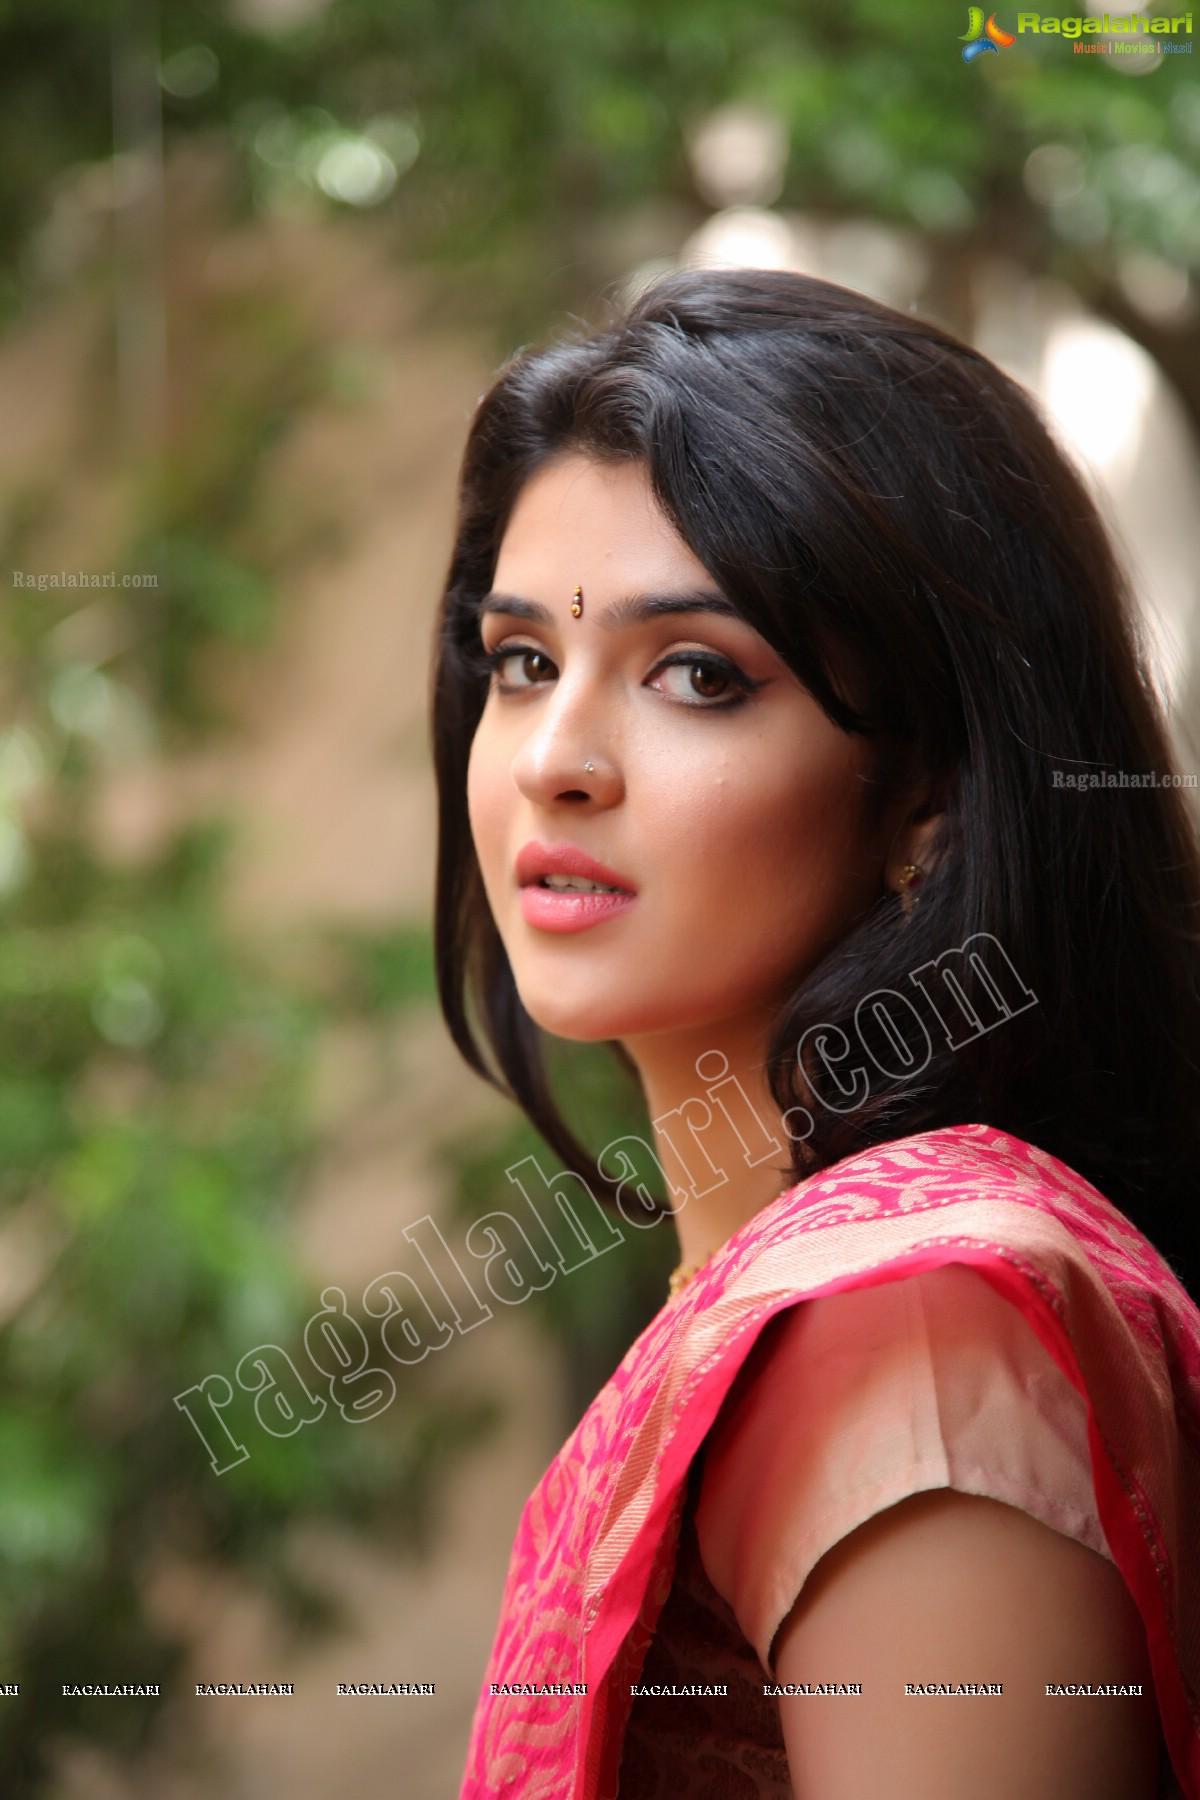 deeksha seth image 35 | telugu heroines posters,images, pics